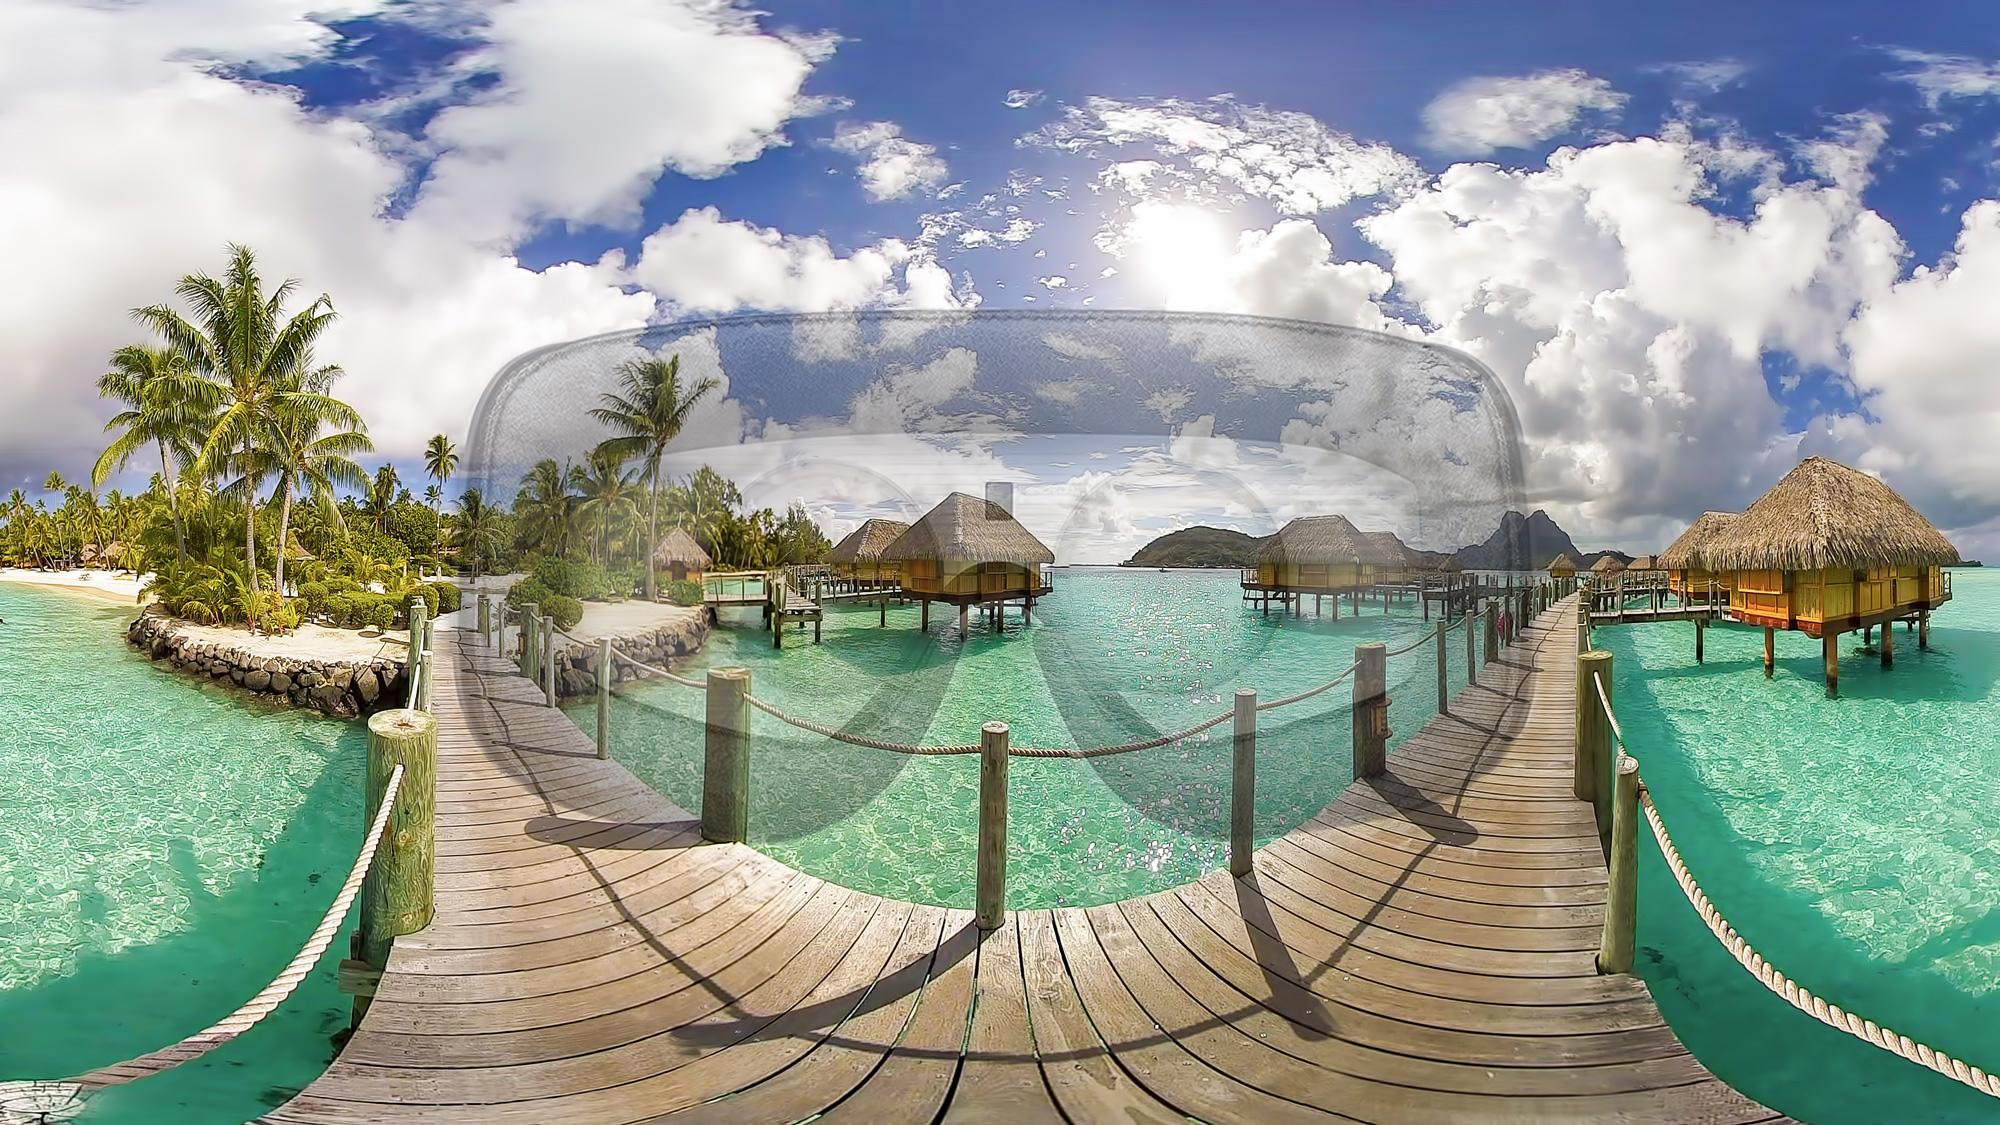 Superswell+VR+Homepage-Tahiti+Bora+Bora+Overwater+Bungalows_Portland+Virtual+Reality+Company.jpg